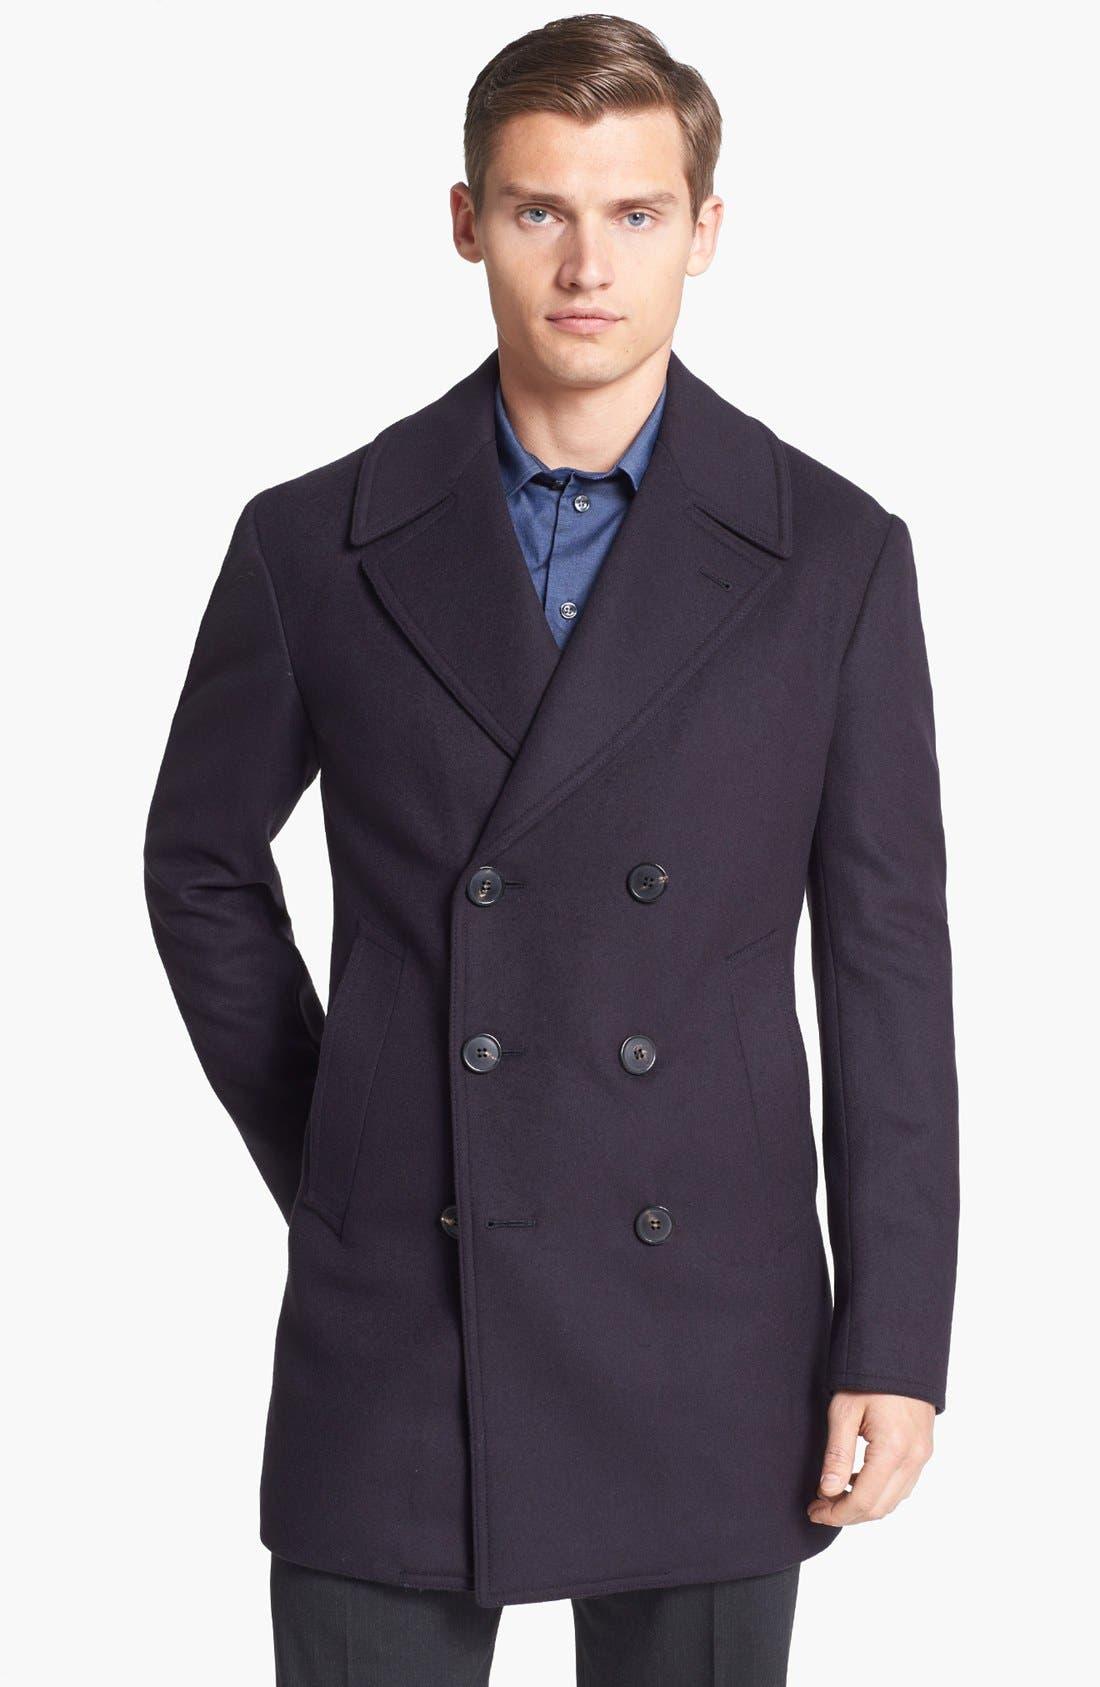 Main Image - Armani Collezioni Wool Blend Peacoat